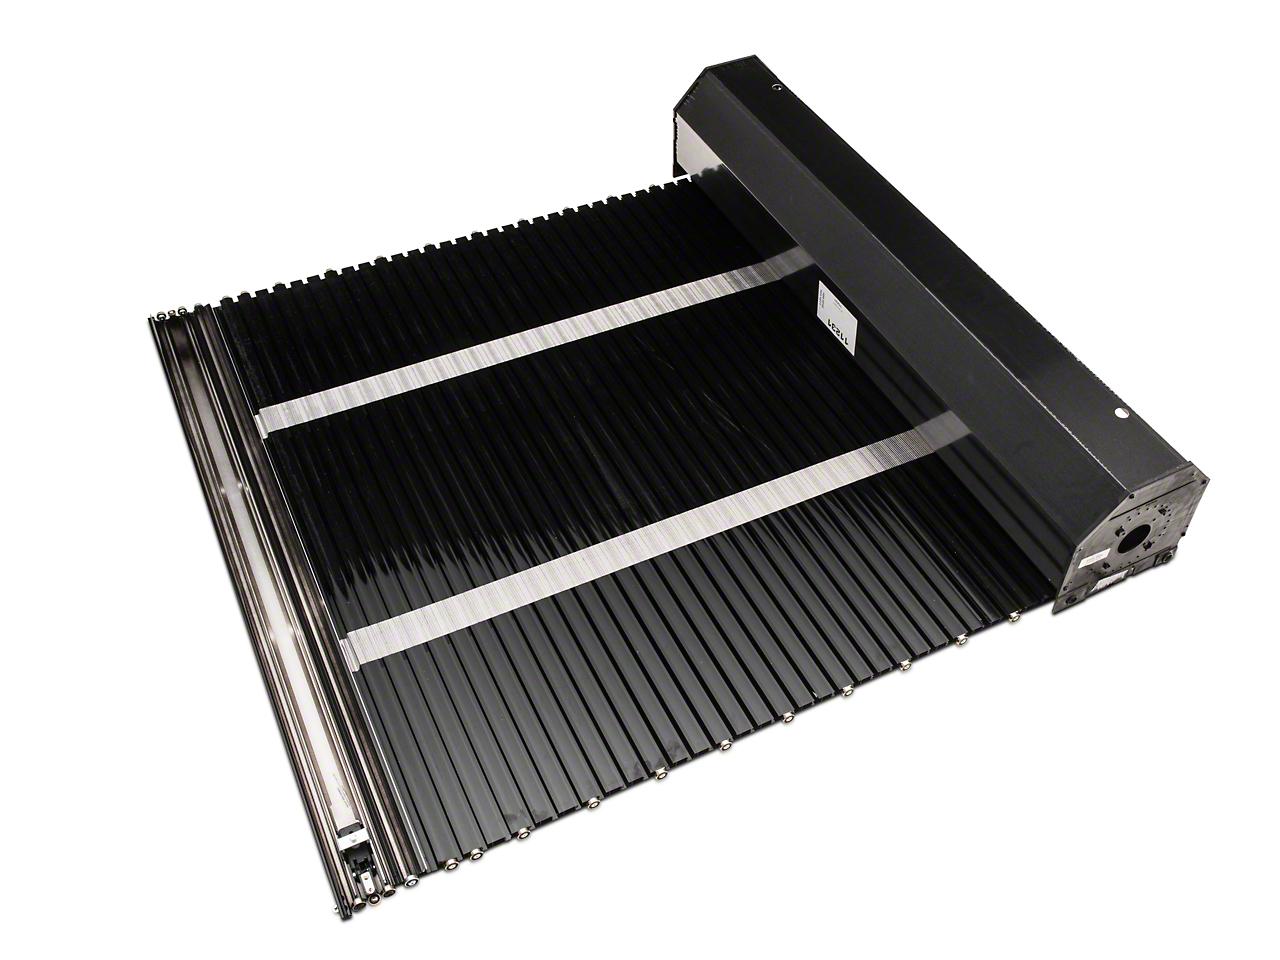 Retrax RetraxONE Tonneau Cover (09-18 RAM 1500 w/ 5.7 ft. & 6.4 ft. Box)